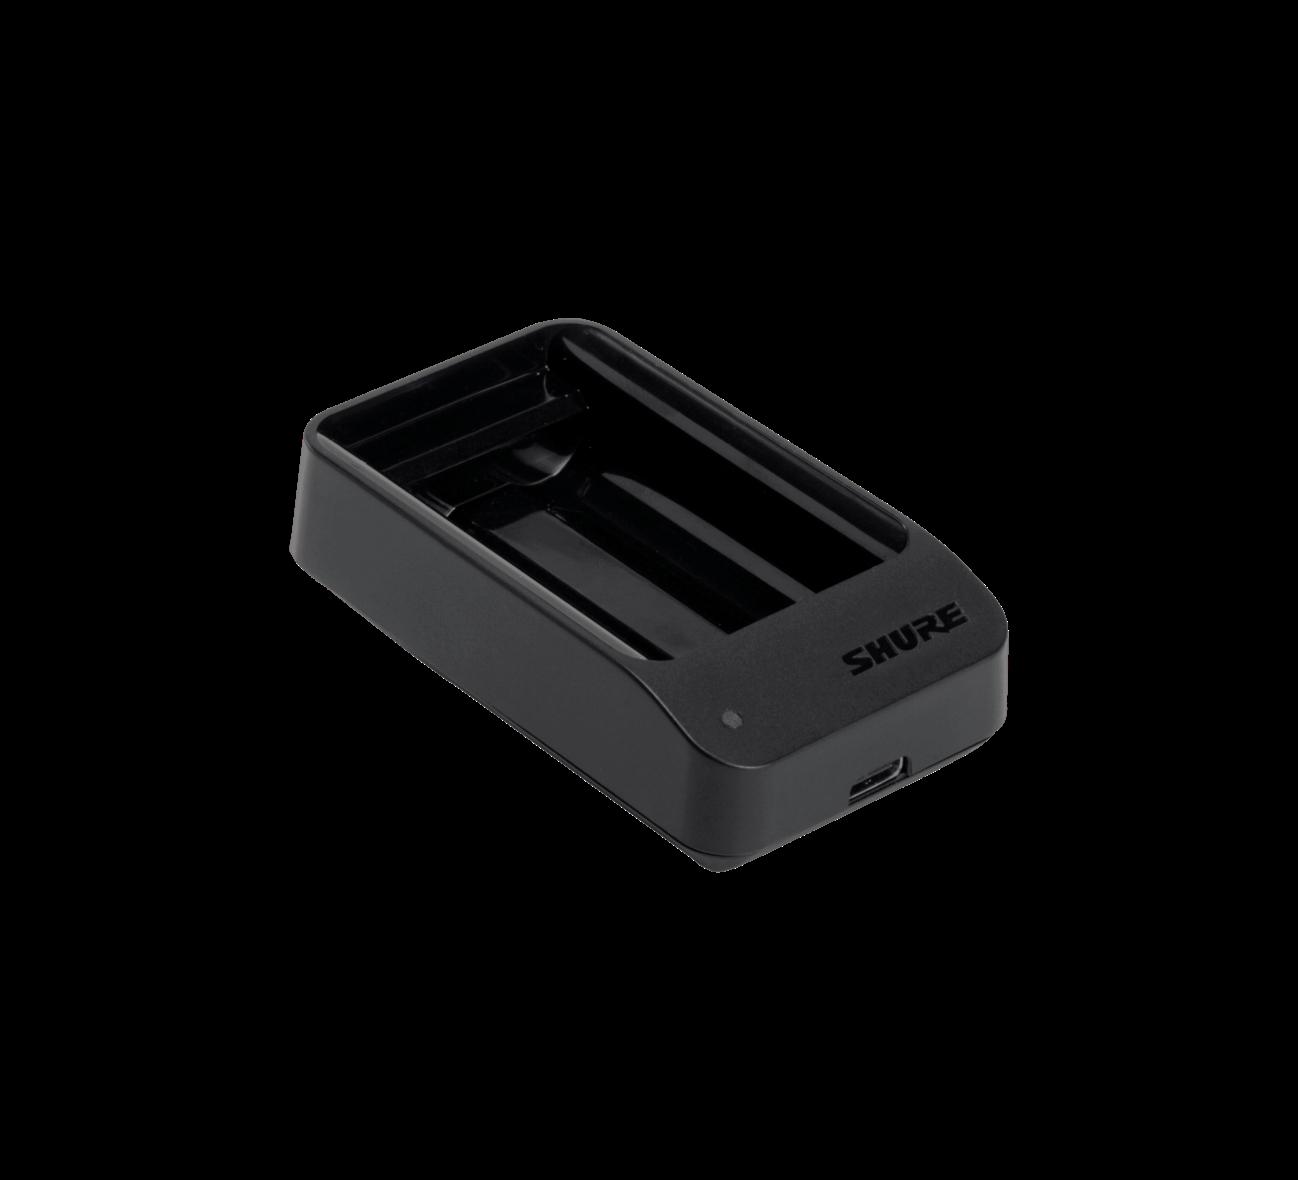 Shure SBC10-903 Single battery charger for SB903 Battery